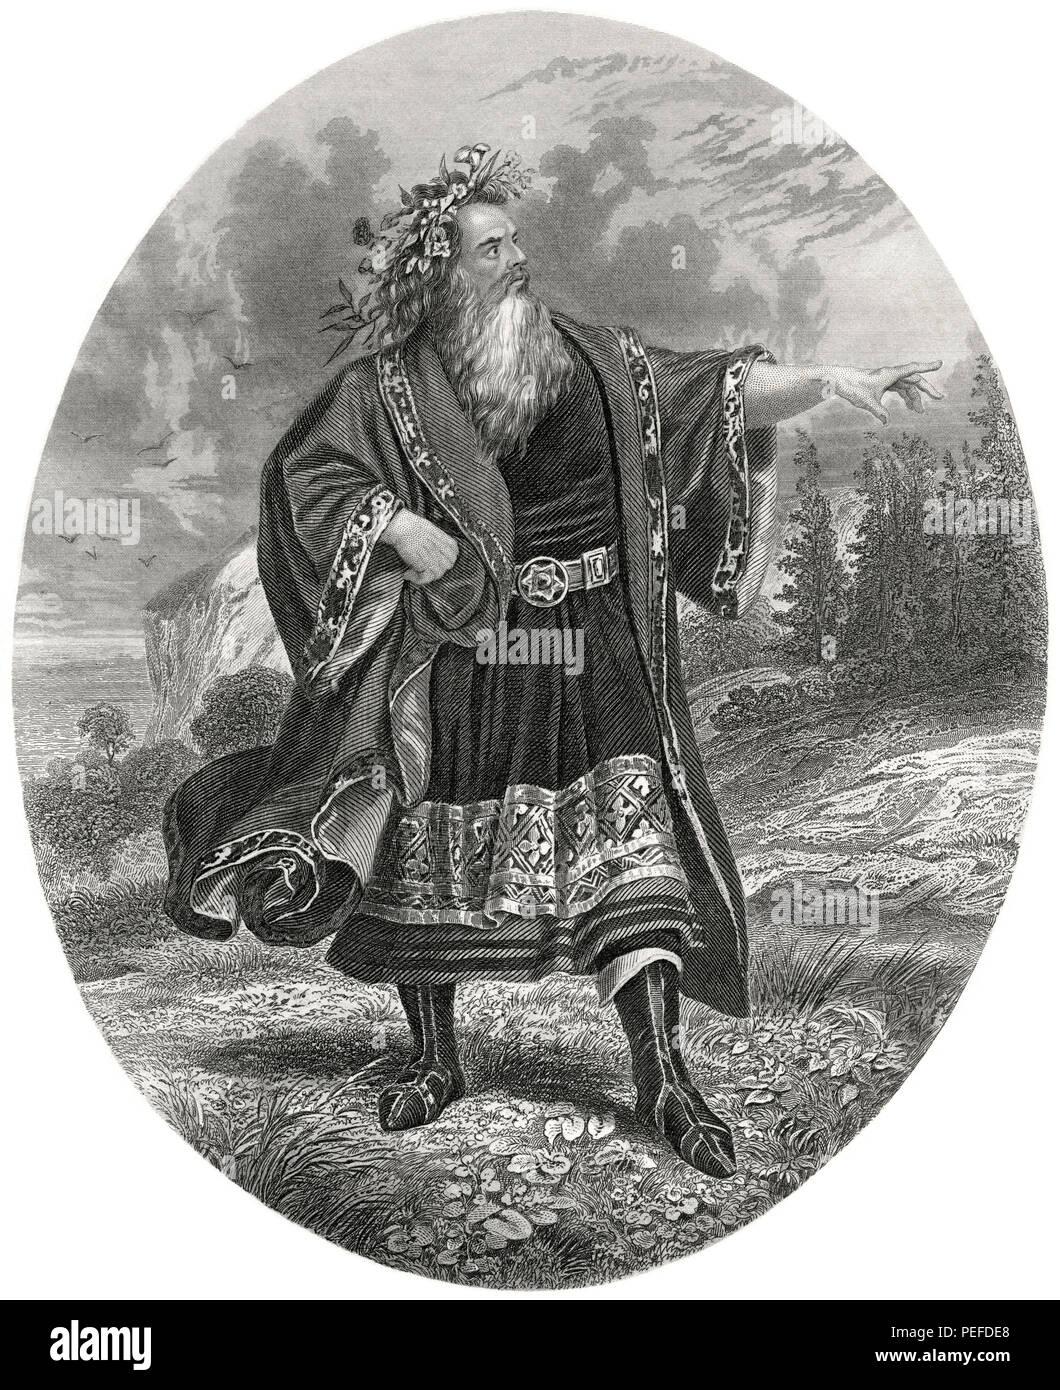 Mr. Edwin Forrest as King Lear, Illustration by Henry J. Johnson, Harper's Monthly Magazine, 1879 - Stock Image